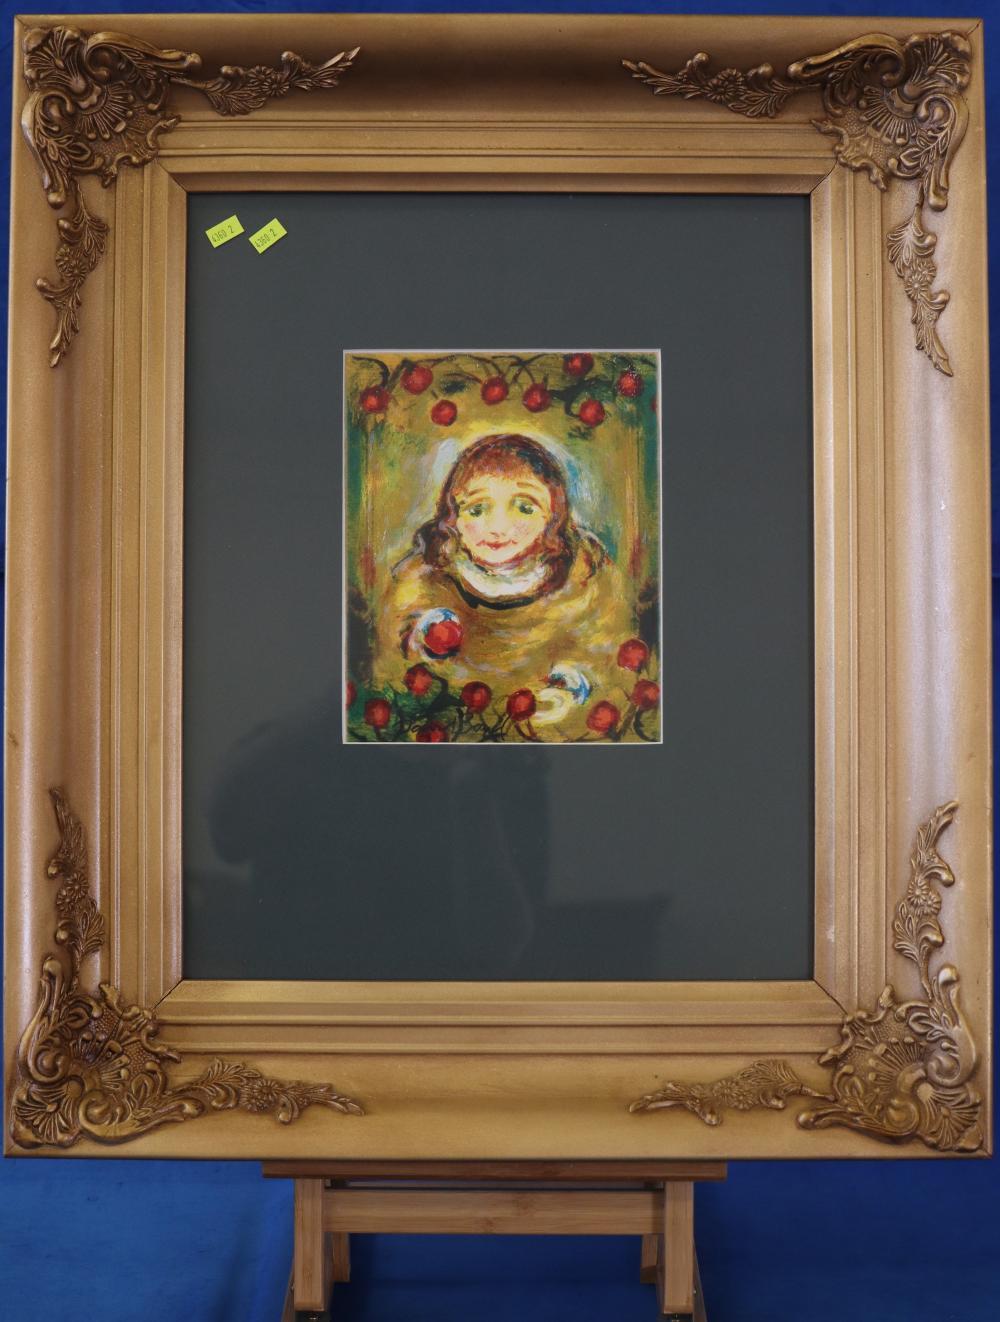 ORIGINAL DAVID BOYD SCREEN PRINT OF GIRL NICELY FRAMED, 20 X 26CM